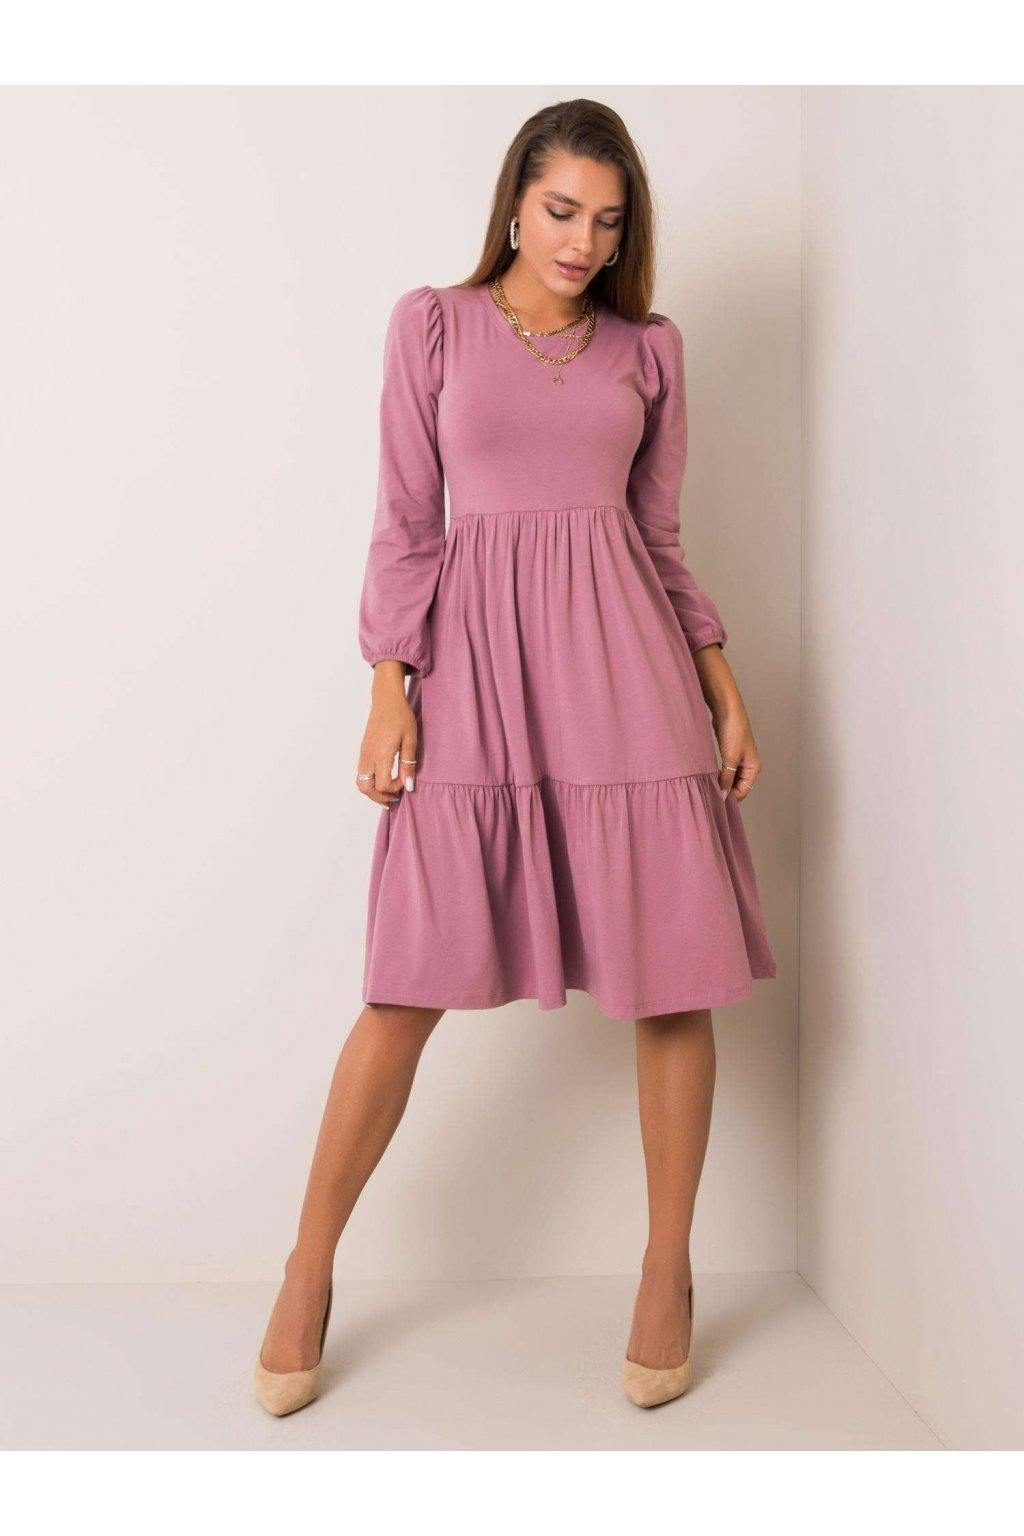 pol pl Brudnorozowa sukienka Yonne RUE PARIS 354175 1